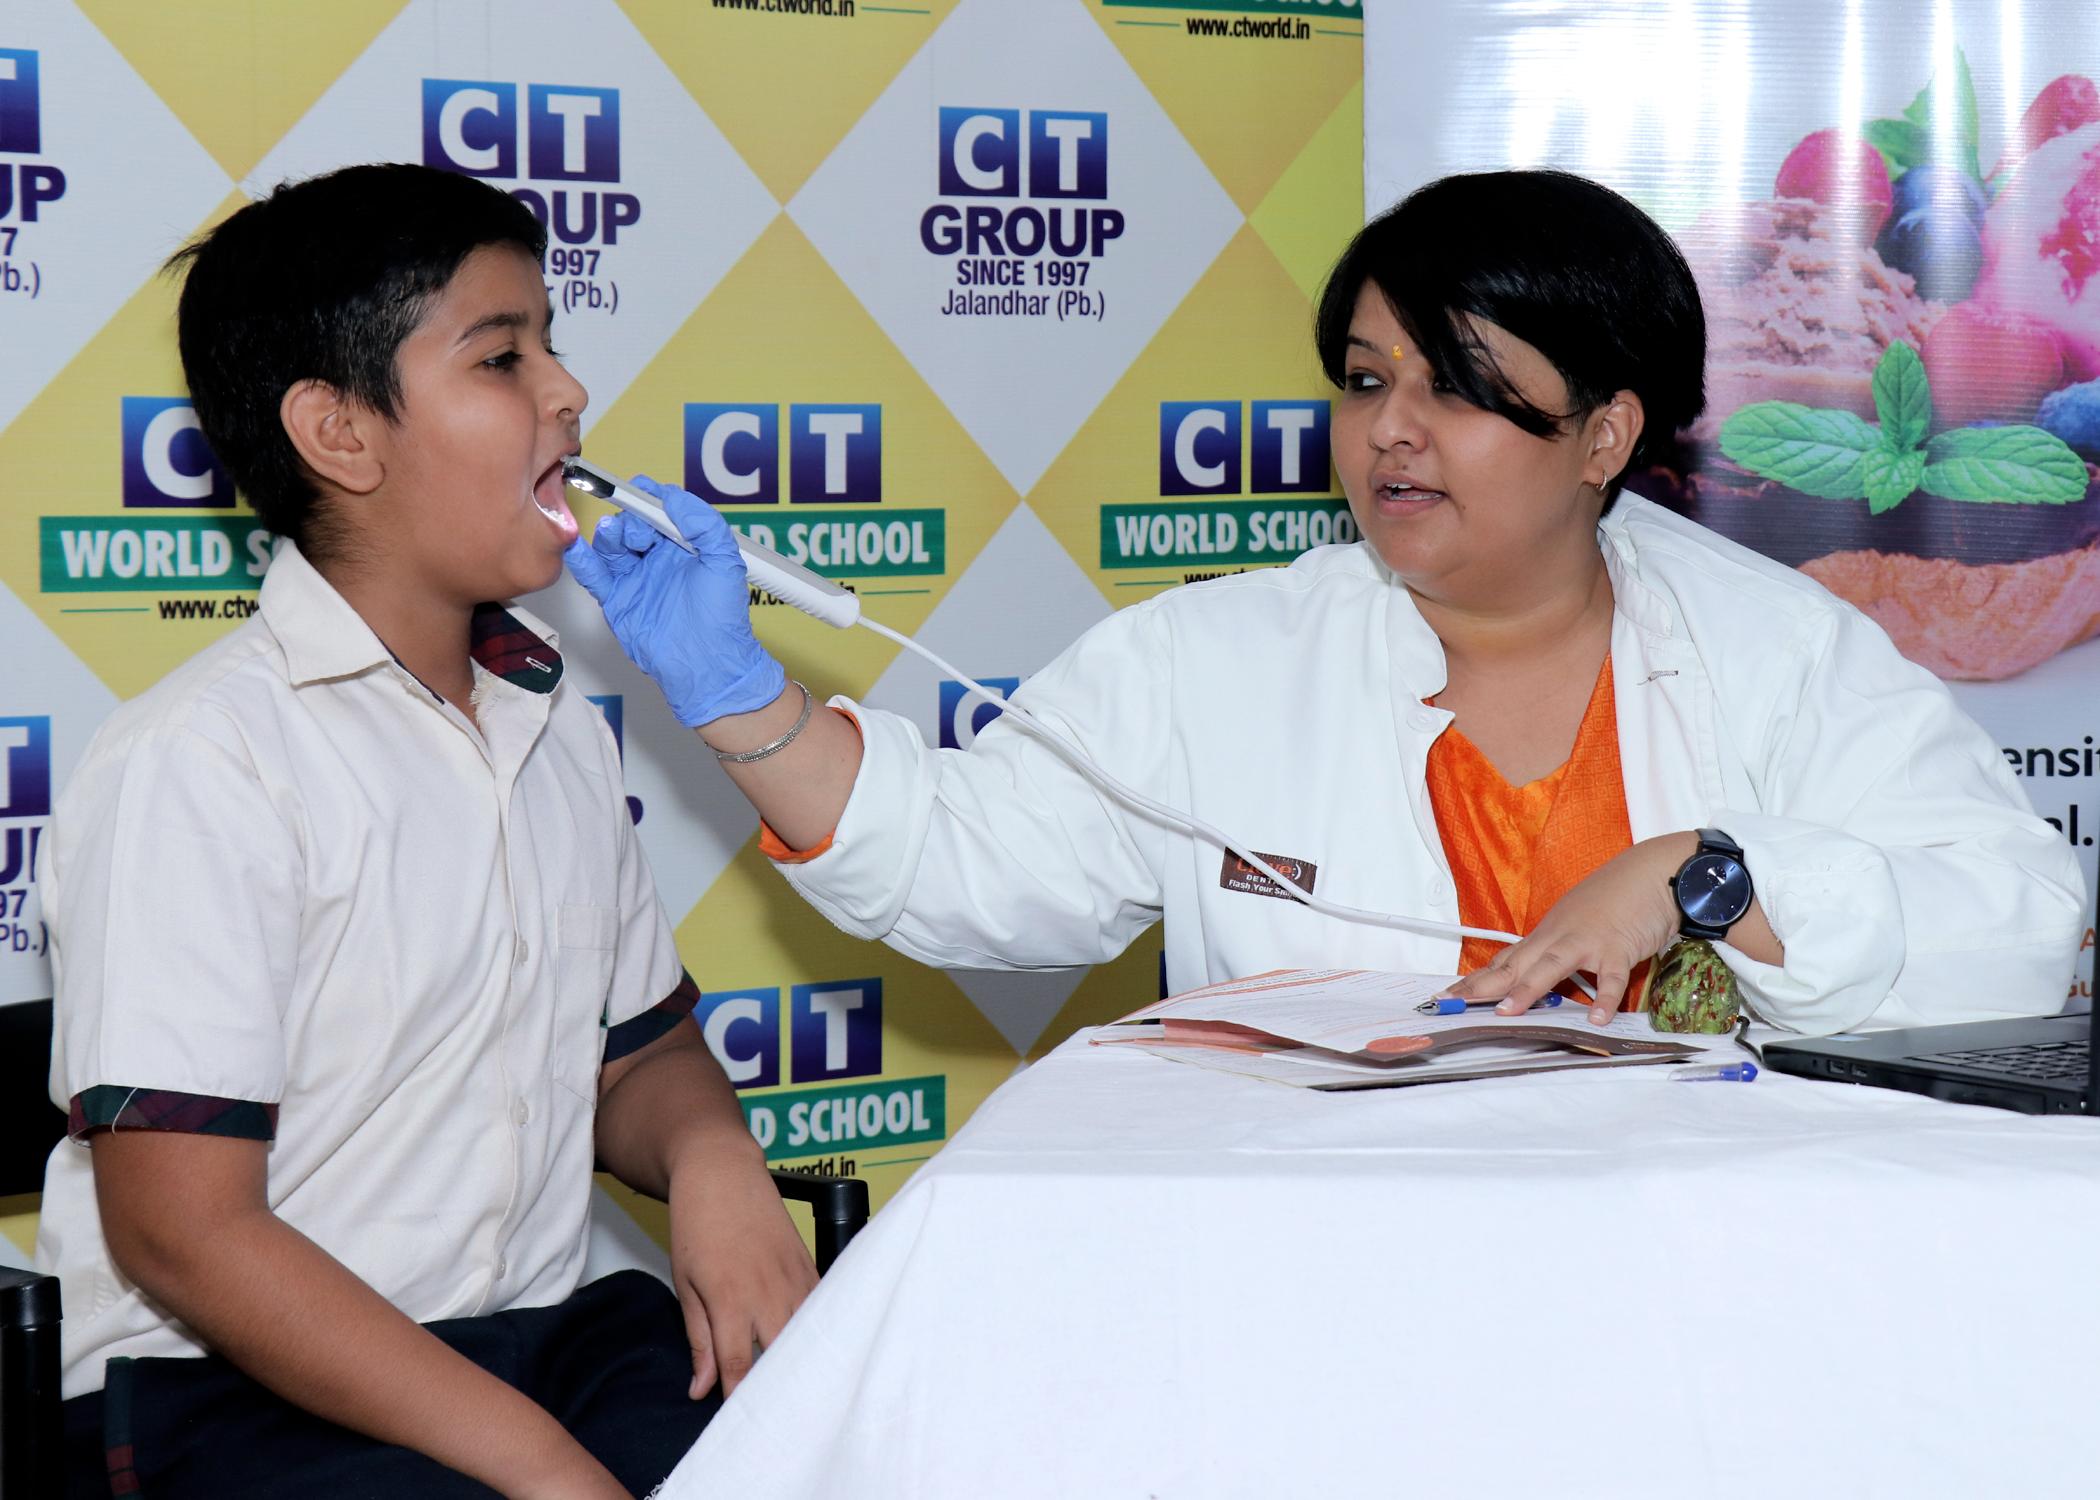 CT Public School & CT World School organises Health check-up camps